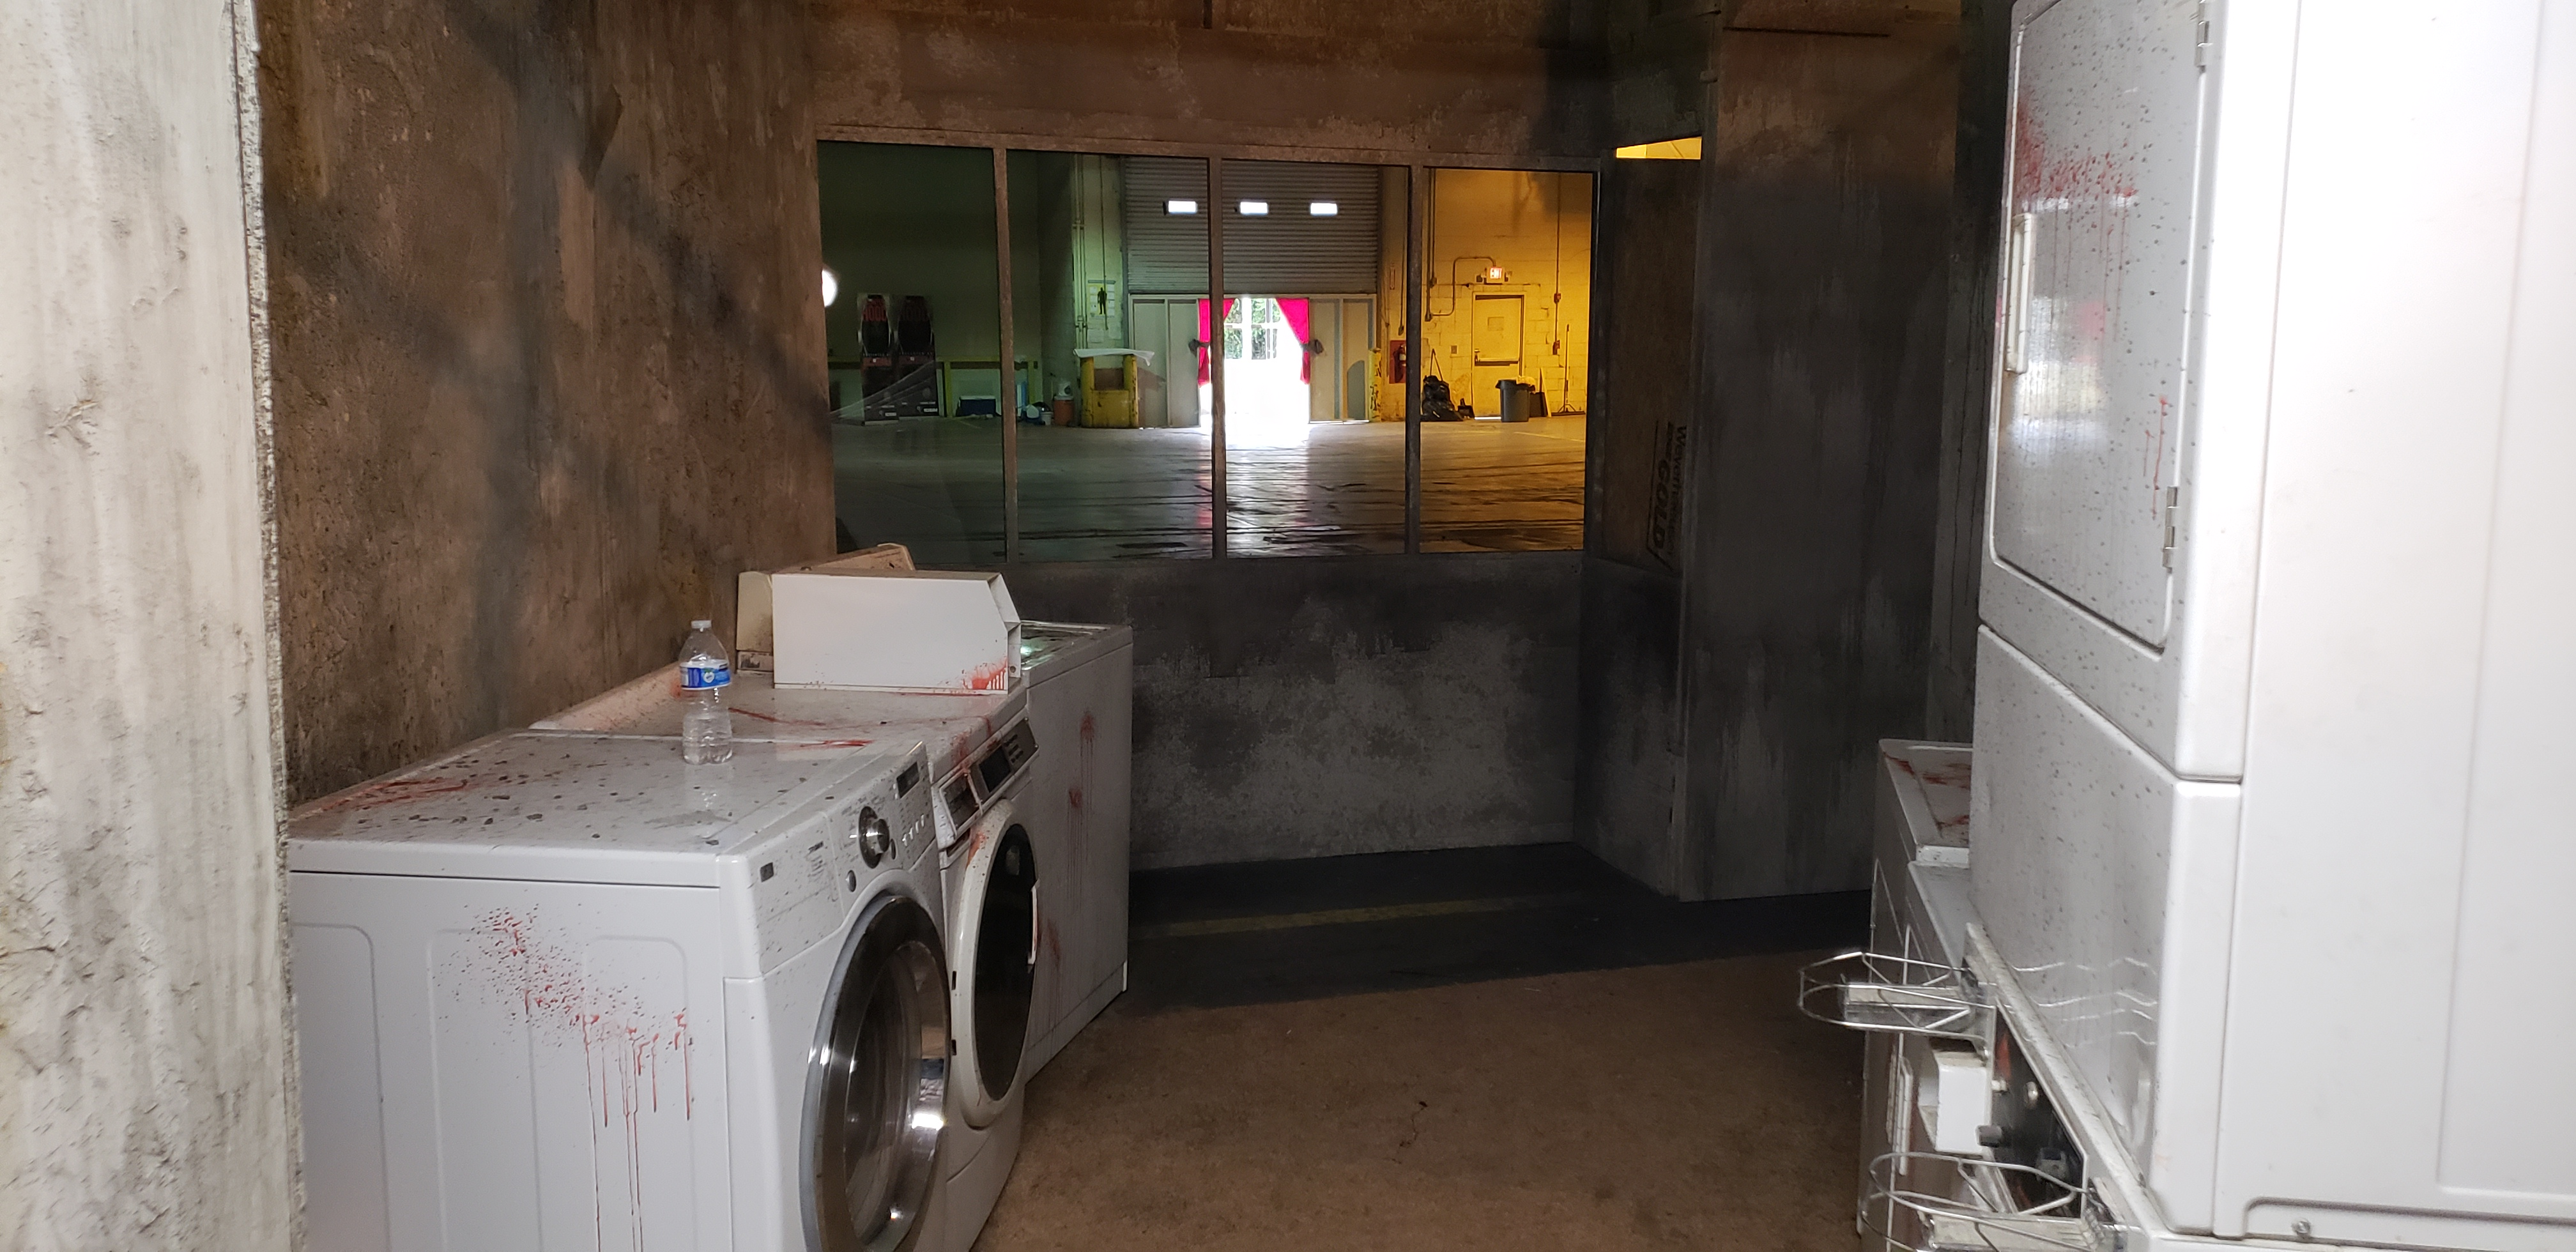 21 5 Laundromat